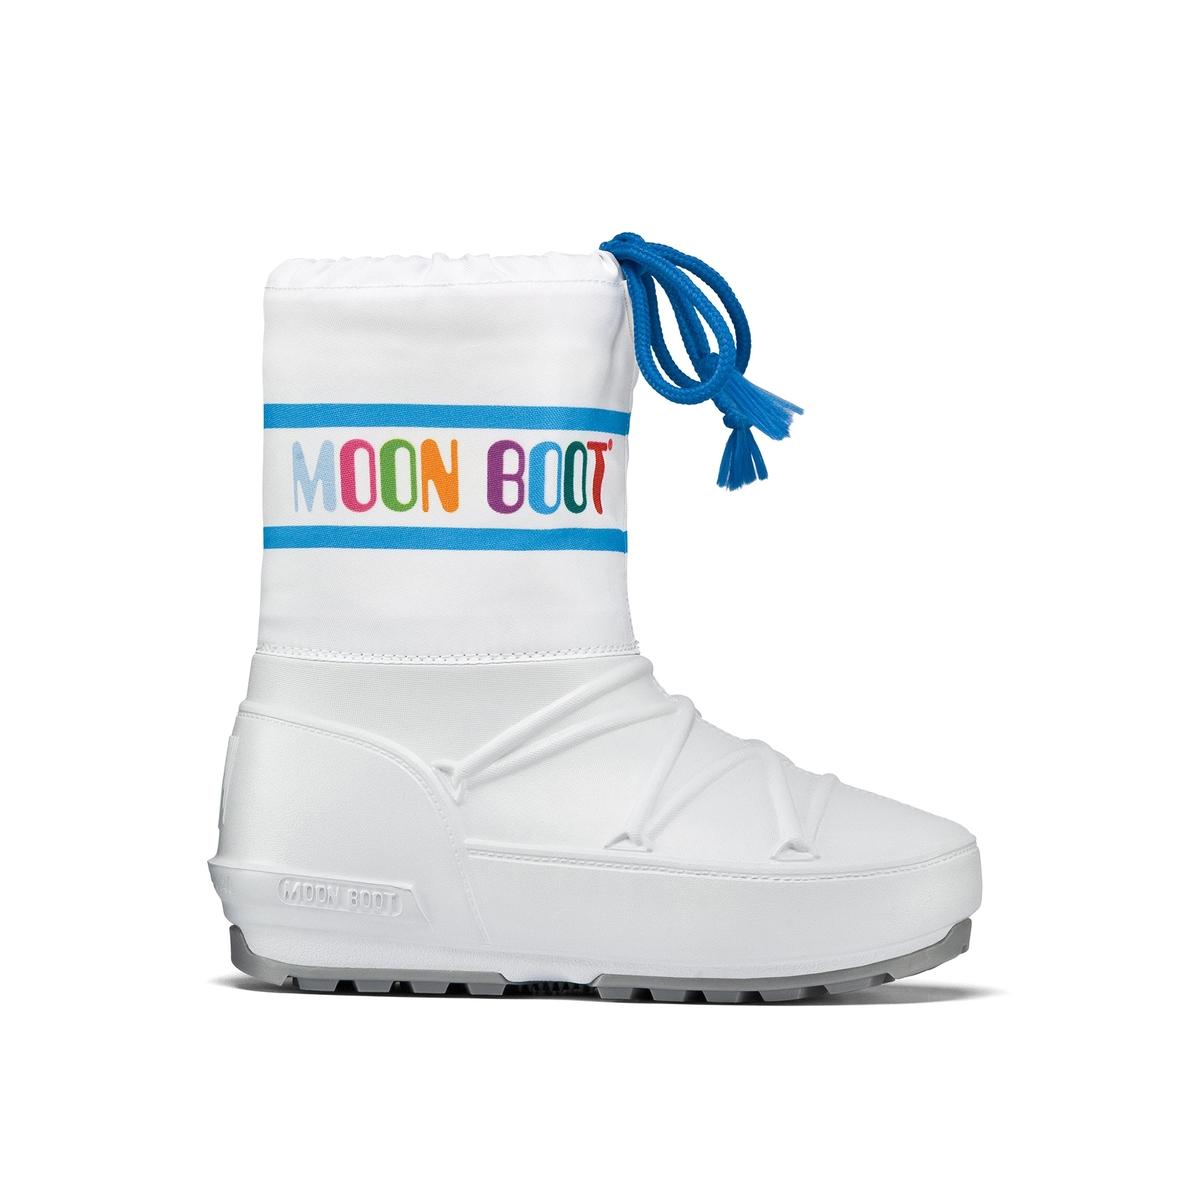 Сапоги POD JR moon boot лыжная одежда